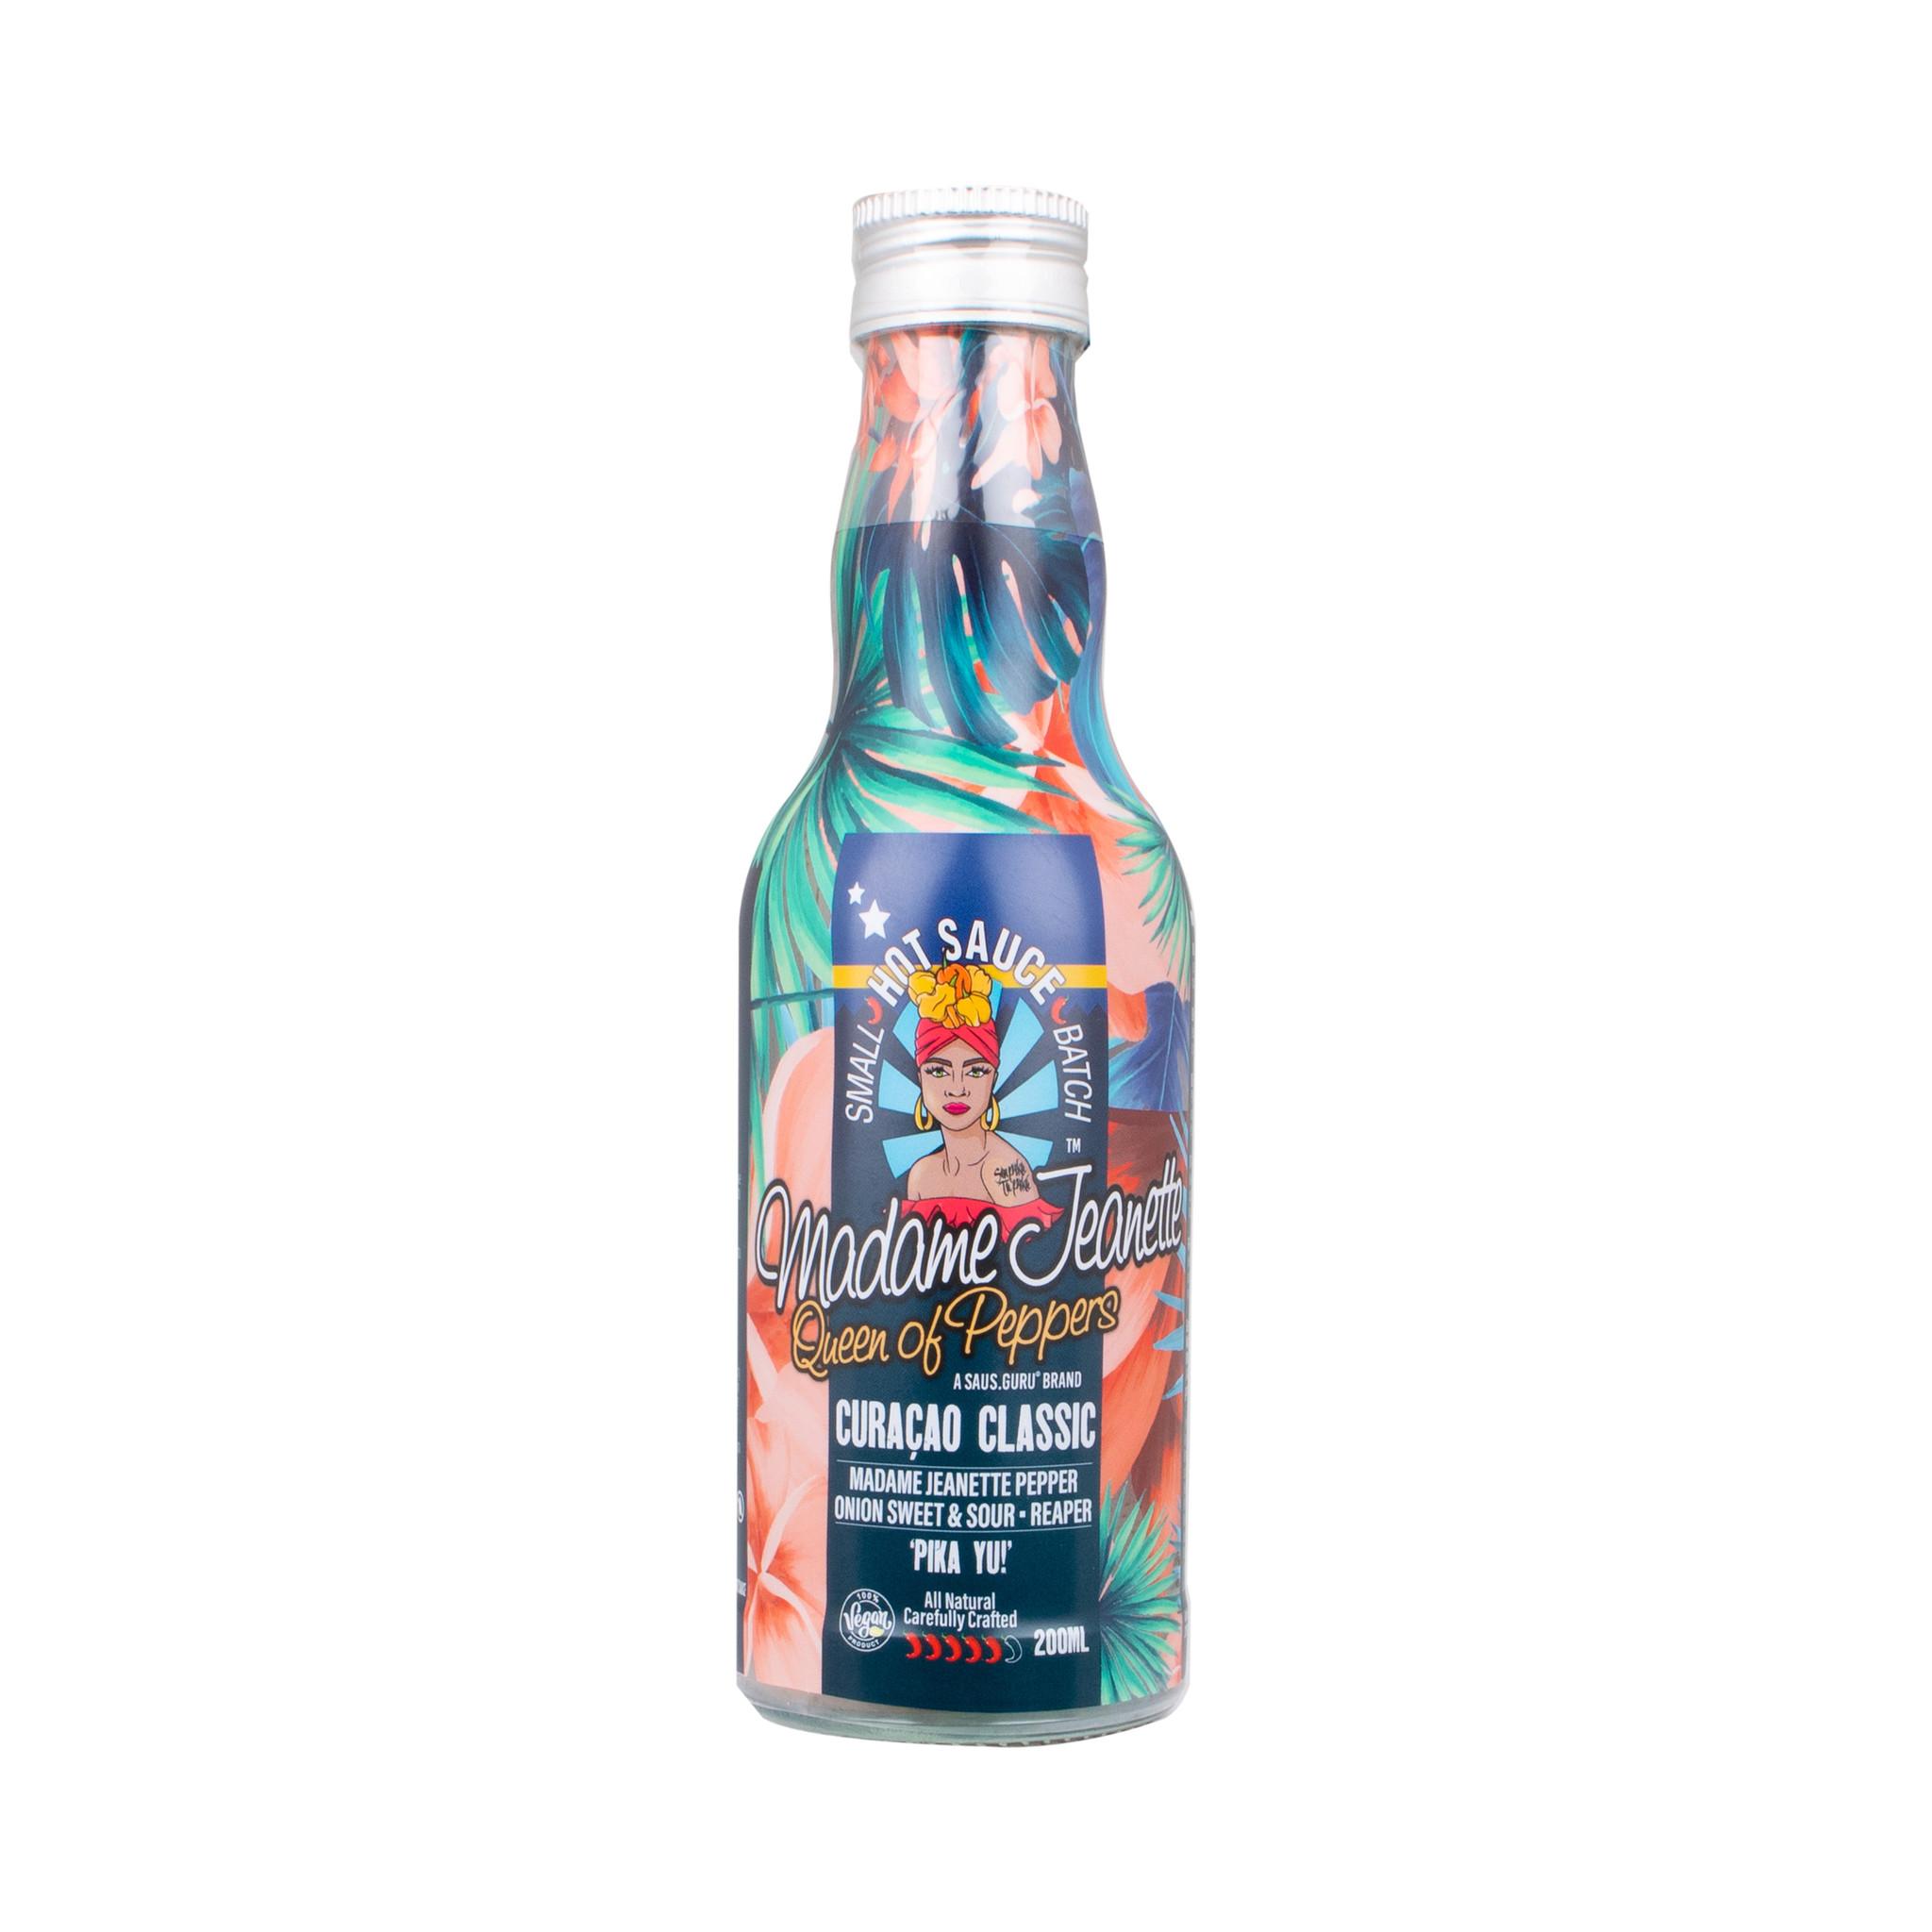 Madame Jeanette Hot Sauce™️ - Curaçao Classic 200ml Glass Bottle-1